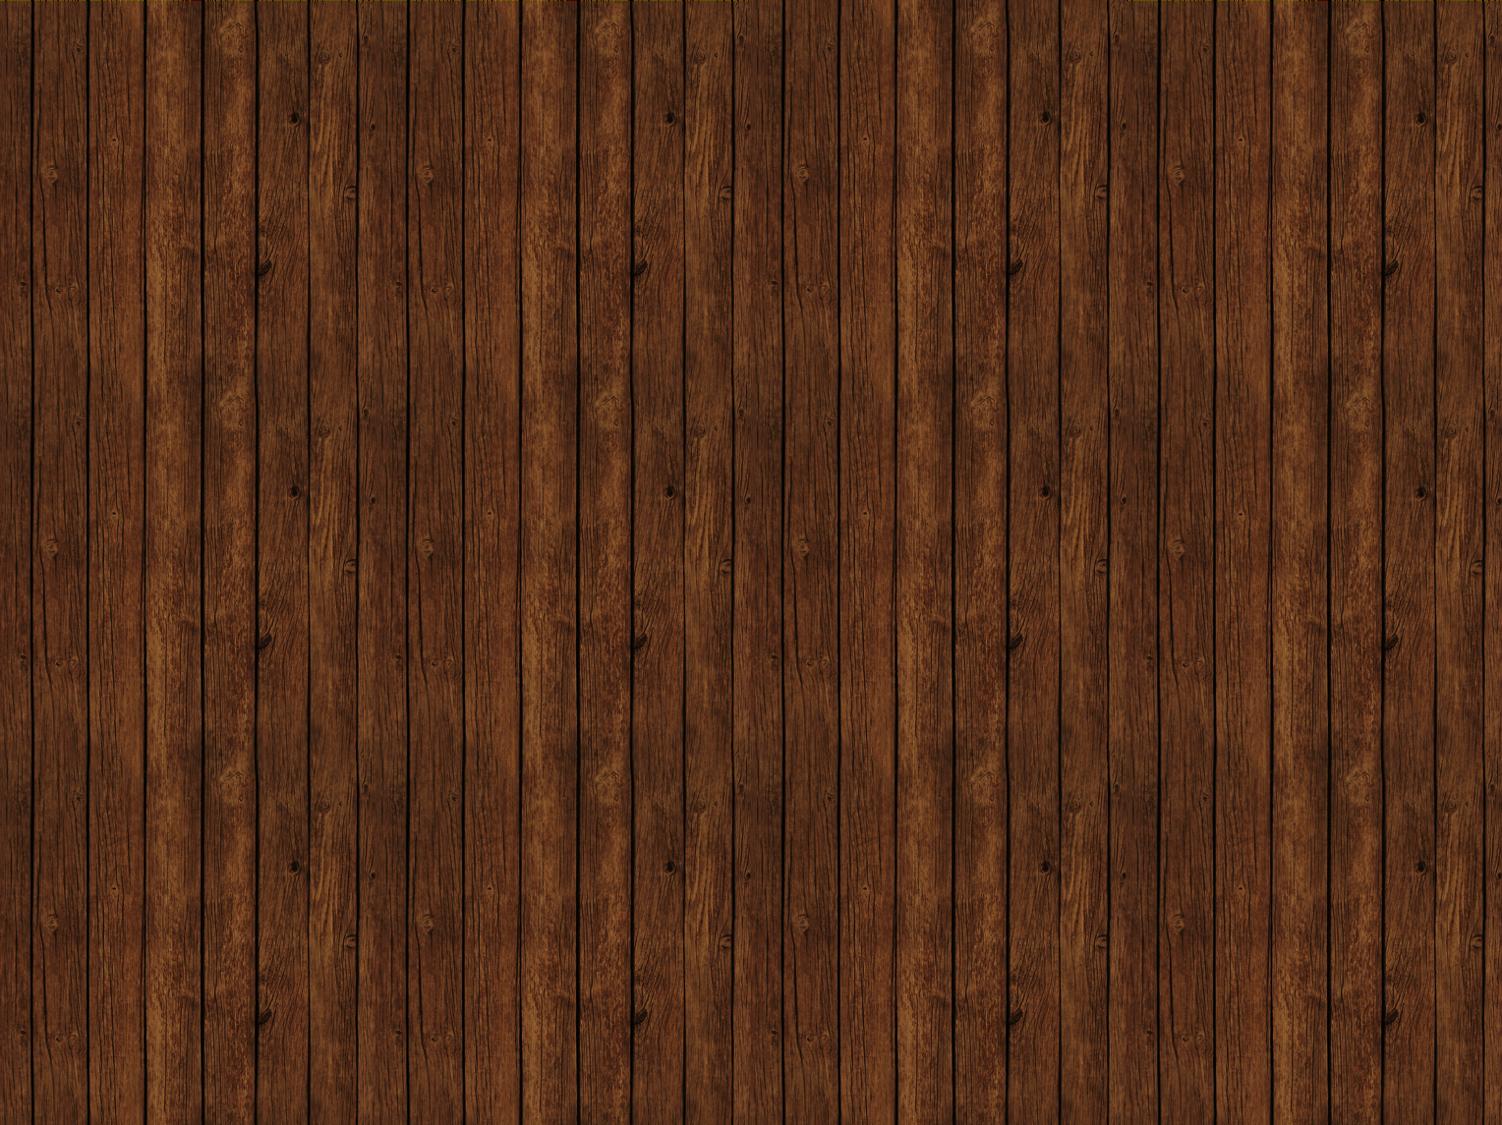 Dollhouse Wallpaper And Flooring Wallpapersafari